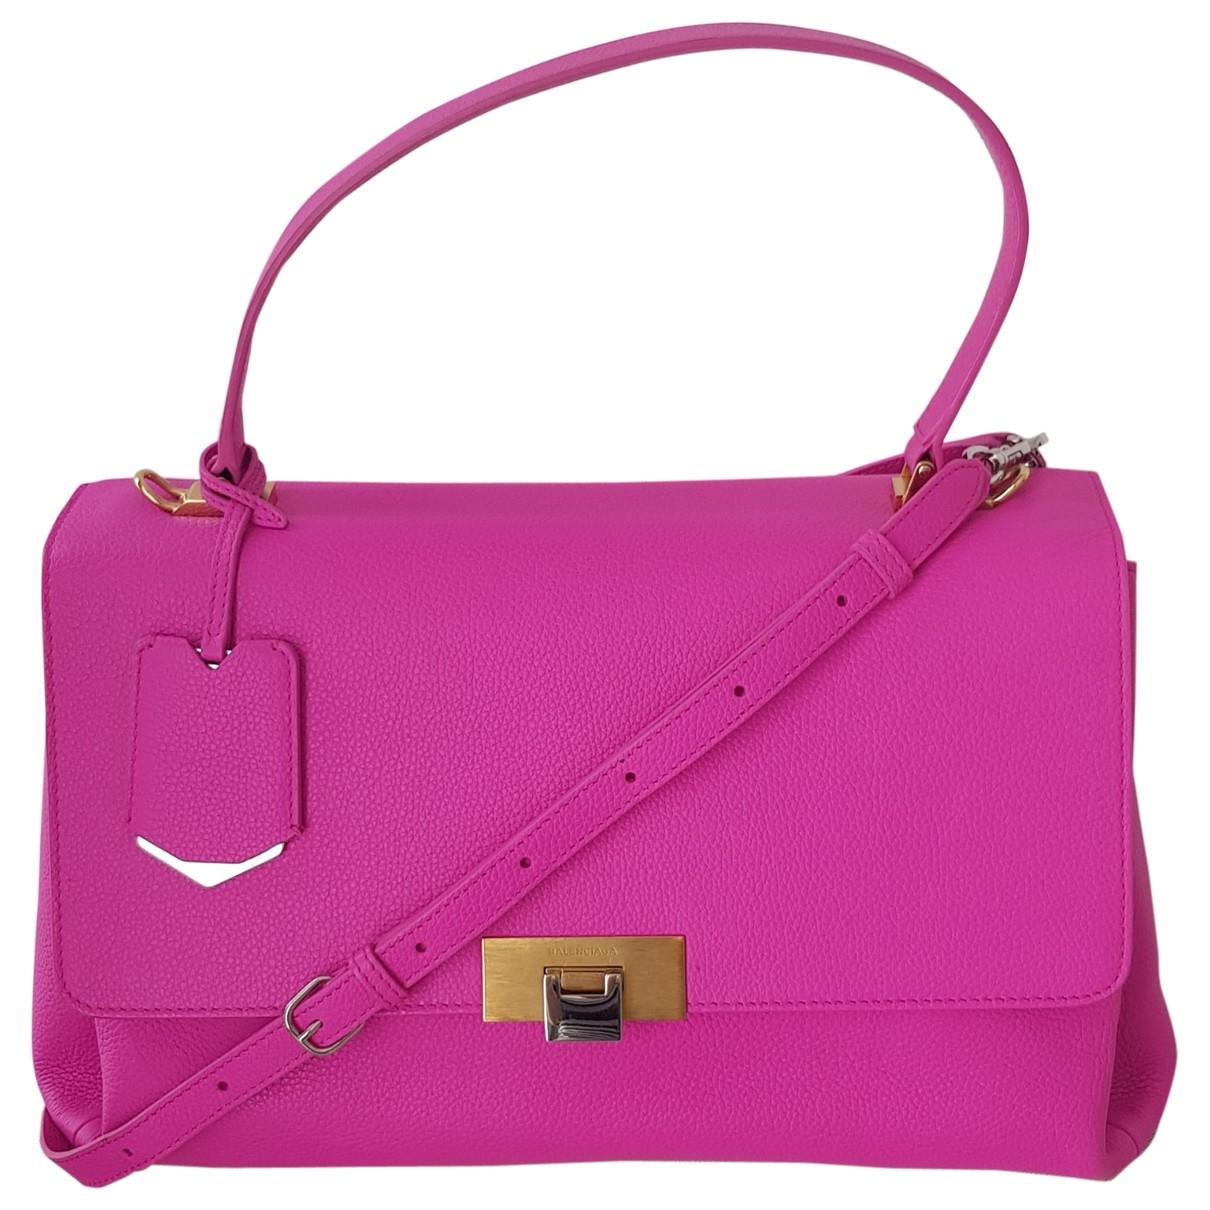 Balenciaga Le Dix Pink Leather handbag for Women \N